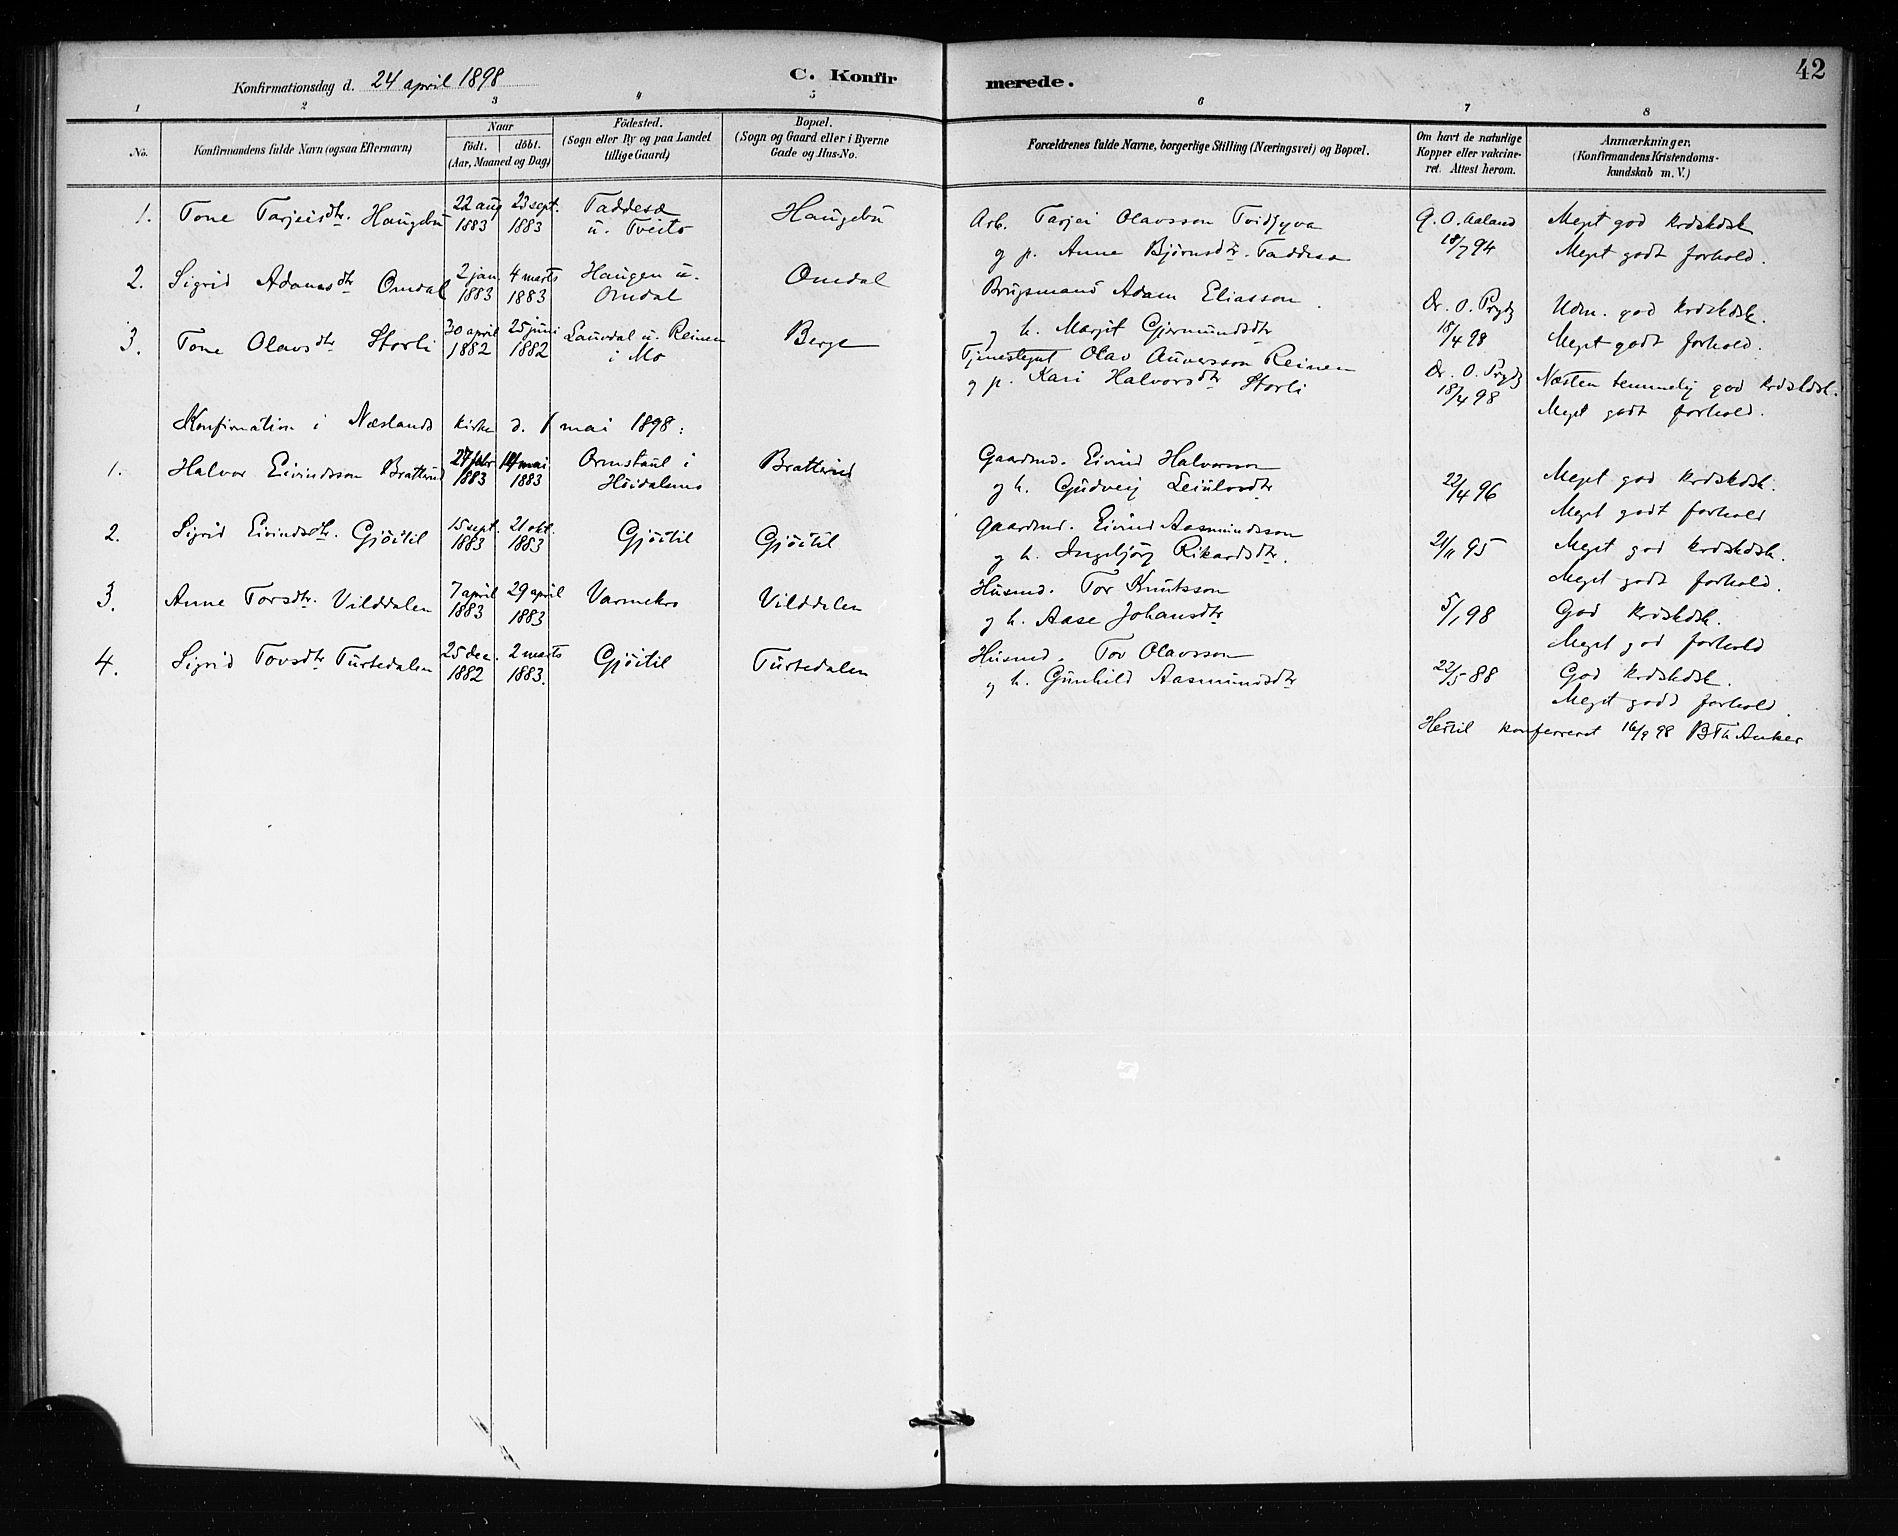 SAKO, Lårdal kirkebøker, G/Gb/L0003: Klokkerbok nr. II 3, 1889-1920, s. 42